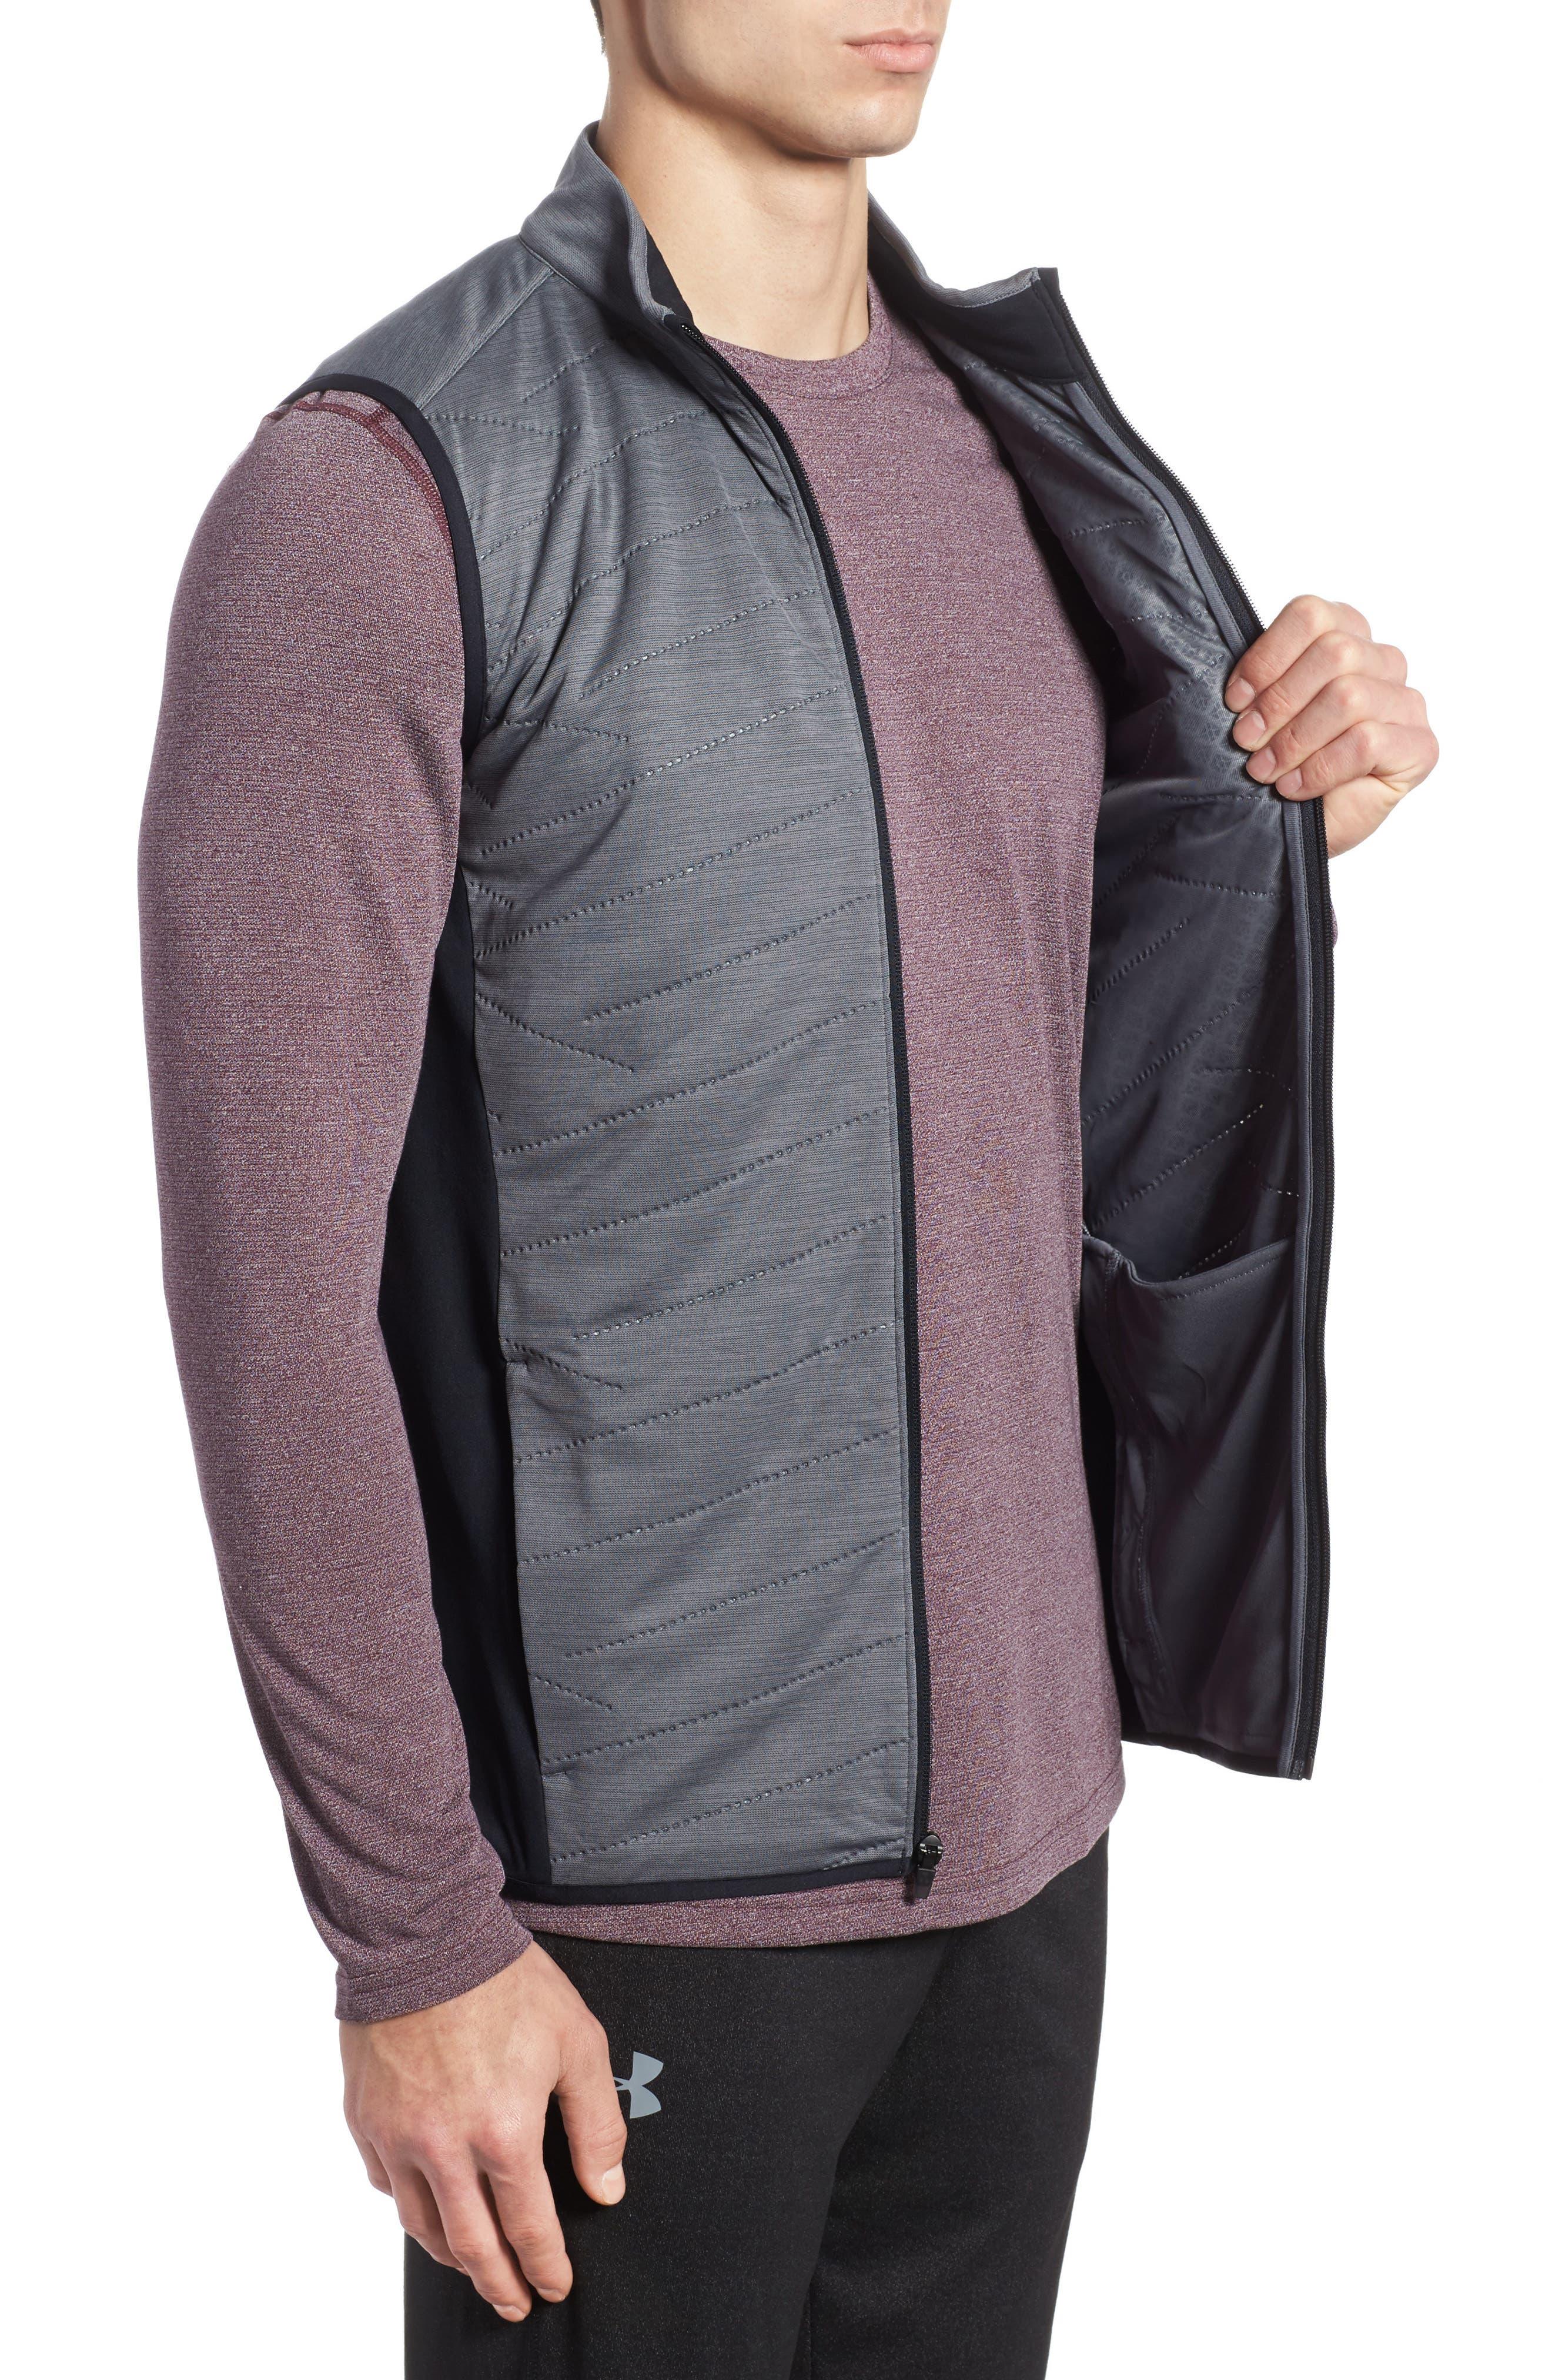 Reactor Hybrid Zip Vest,                             Alternate thumbnail 3, color,                             076